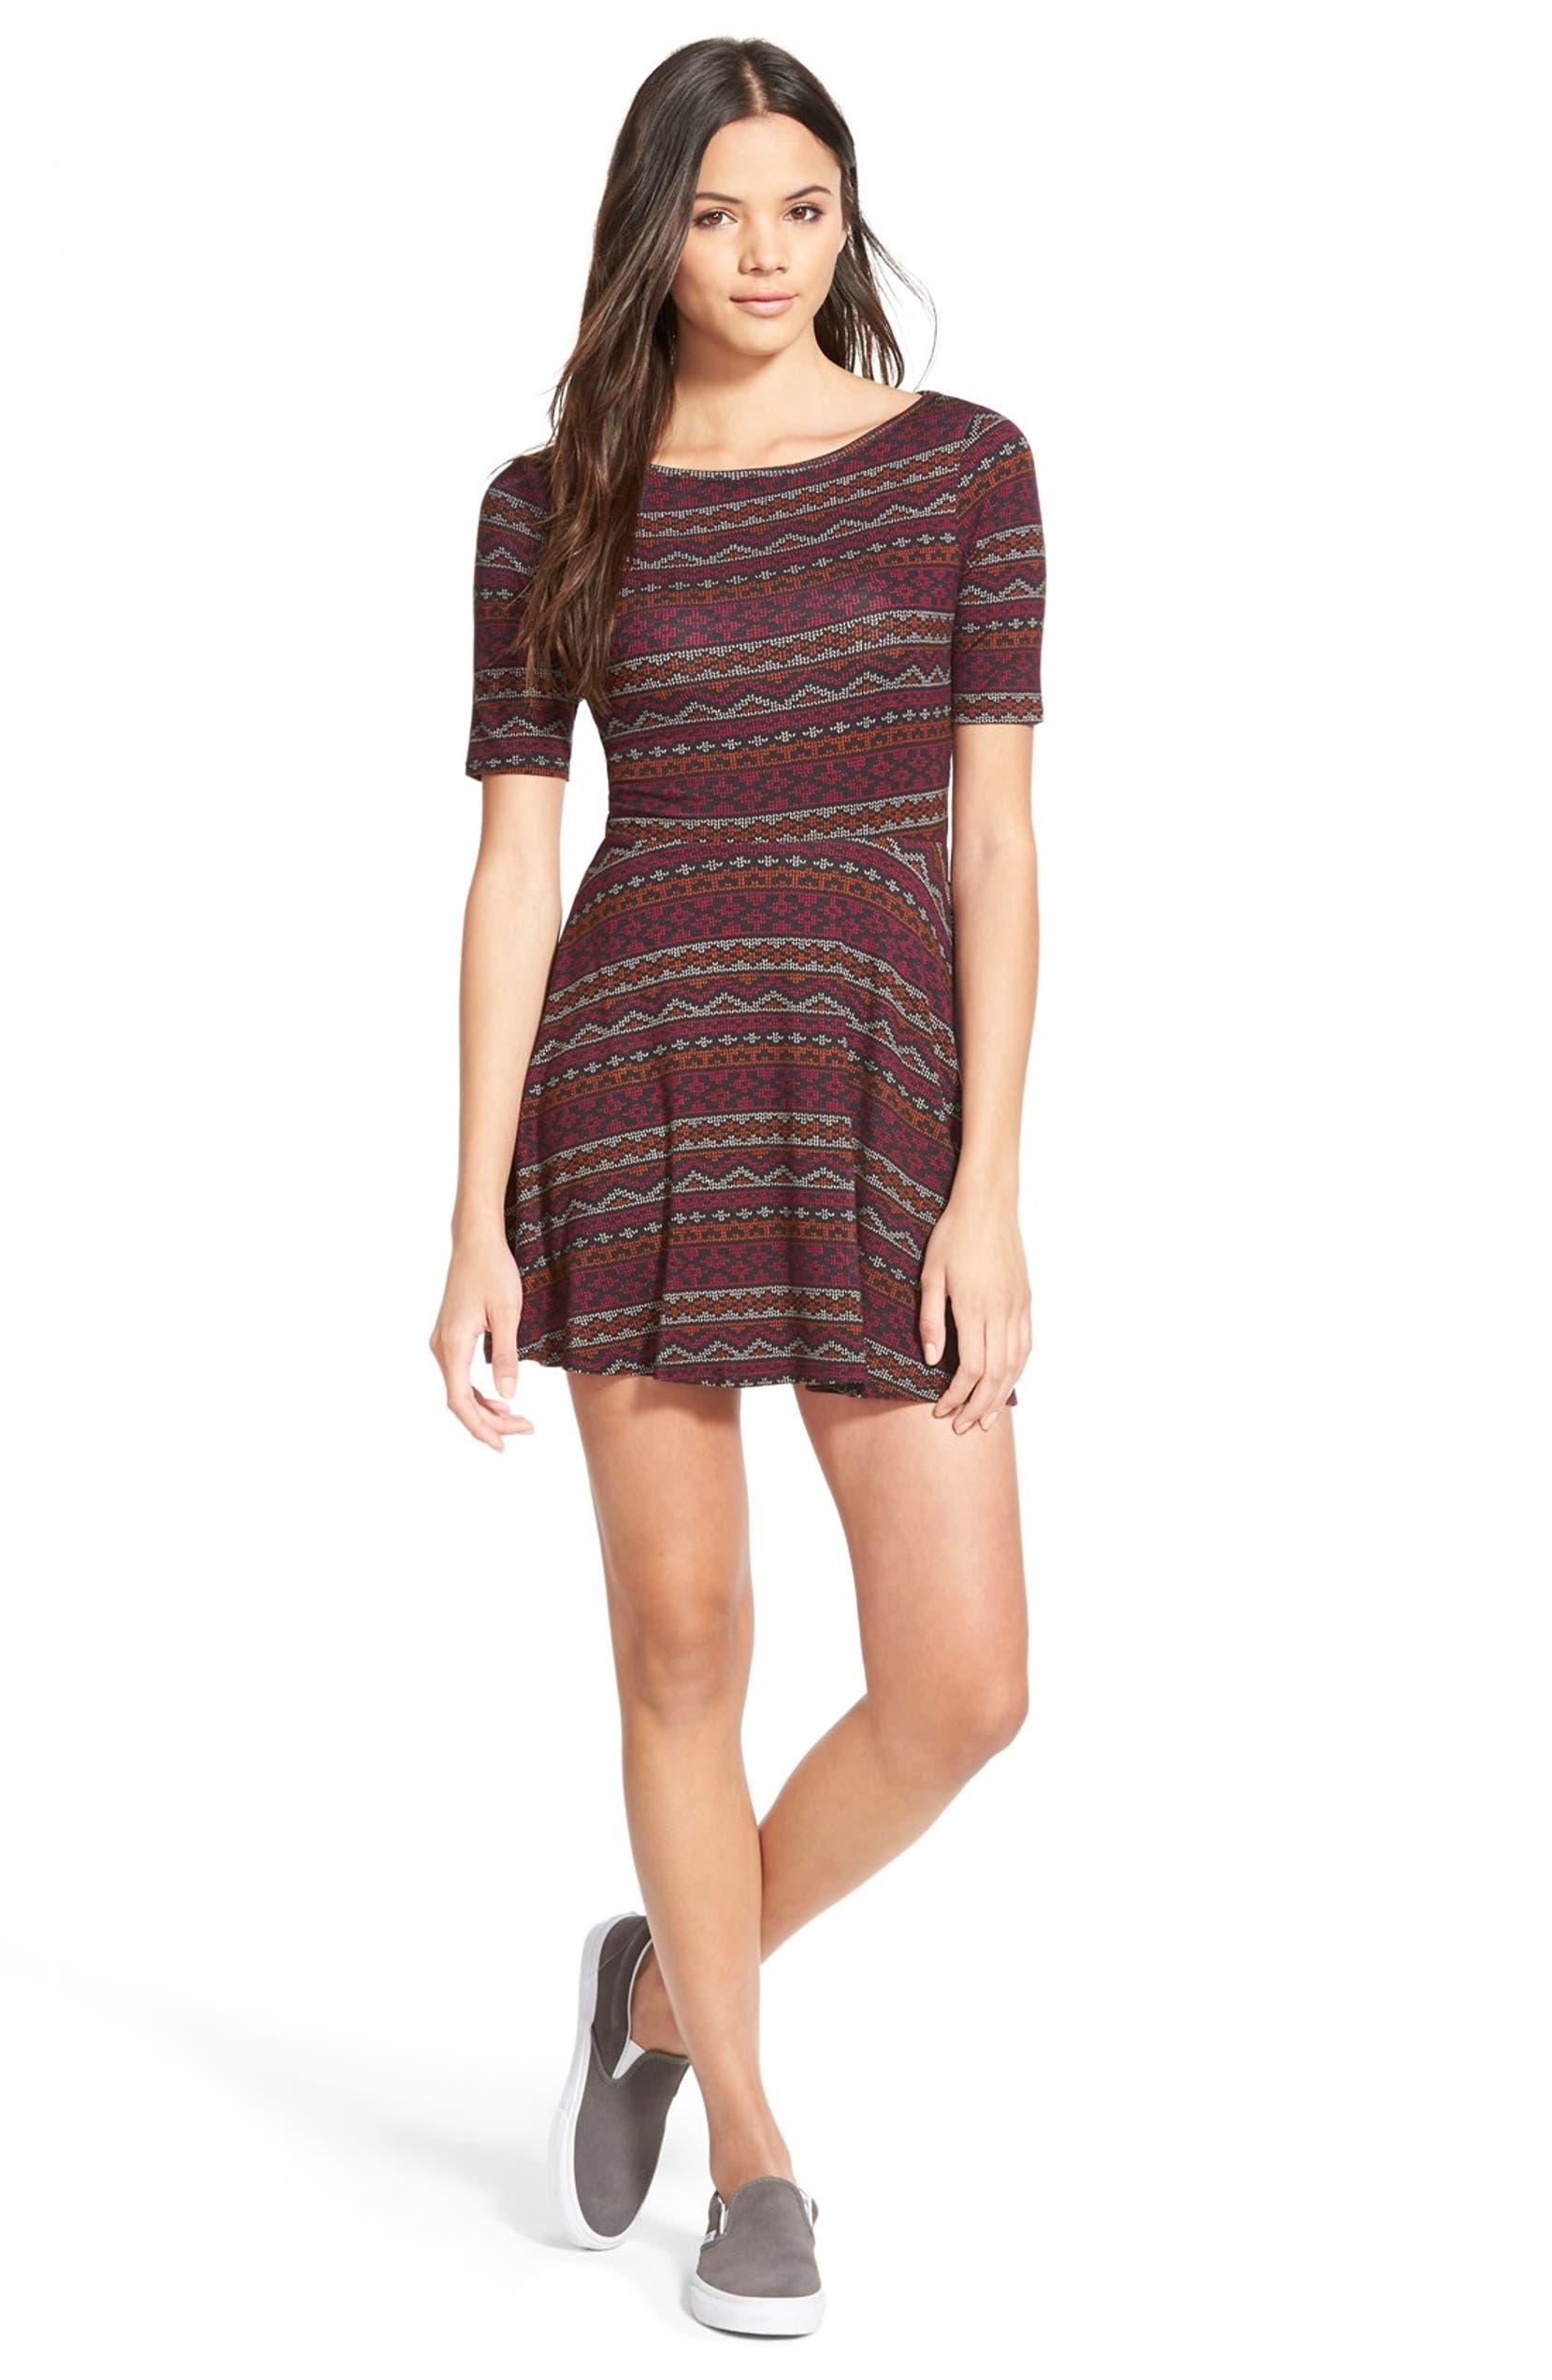 a1d8f3c1e1d0a Stripe Print Knit Skater Dress